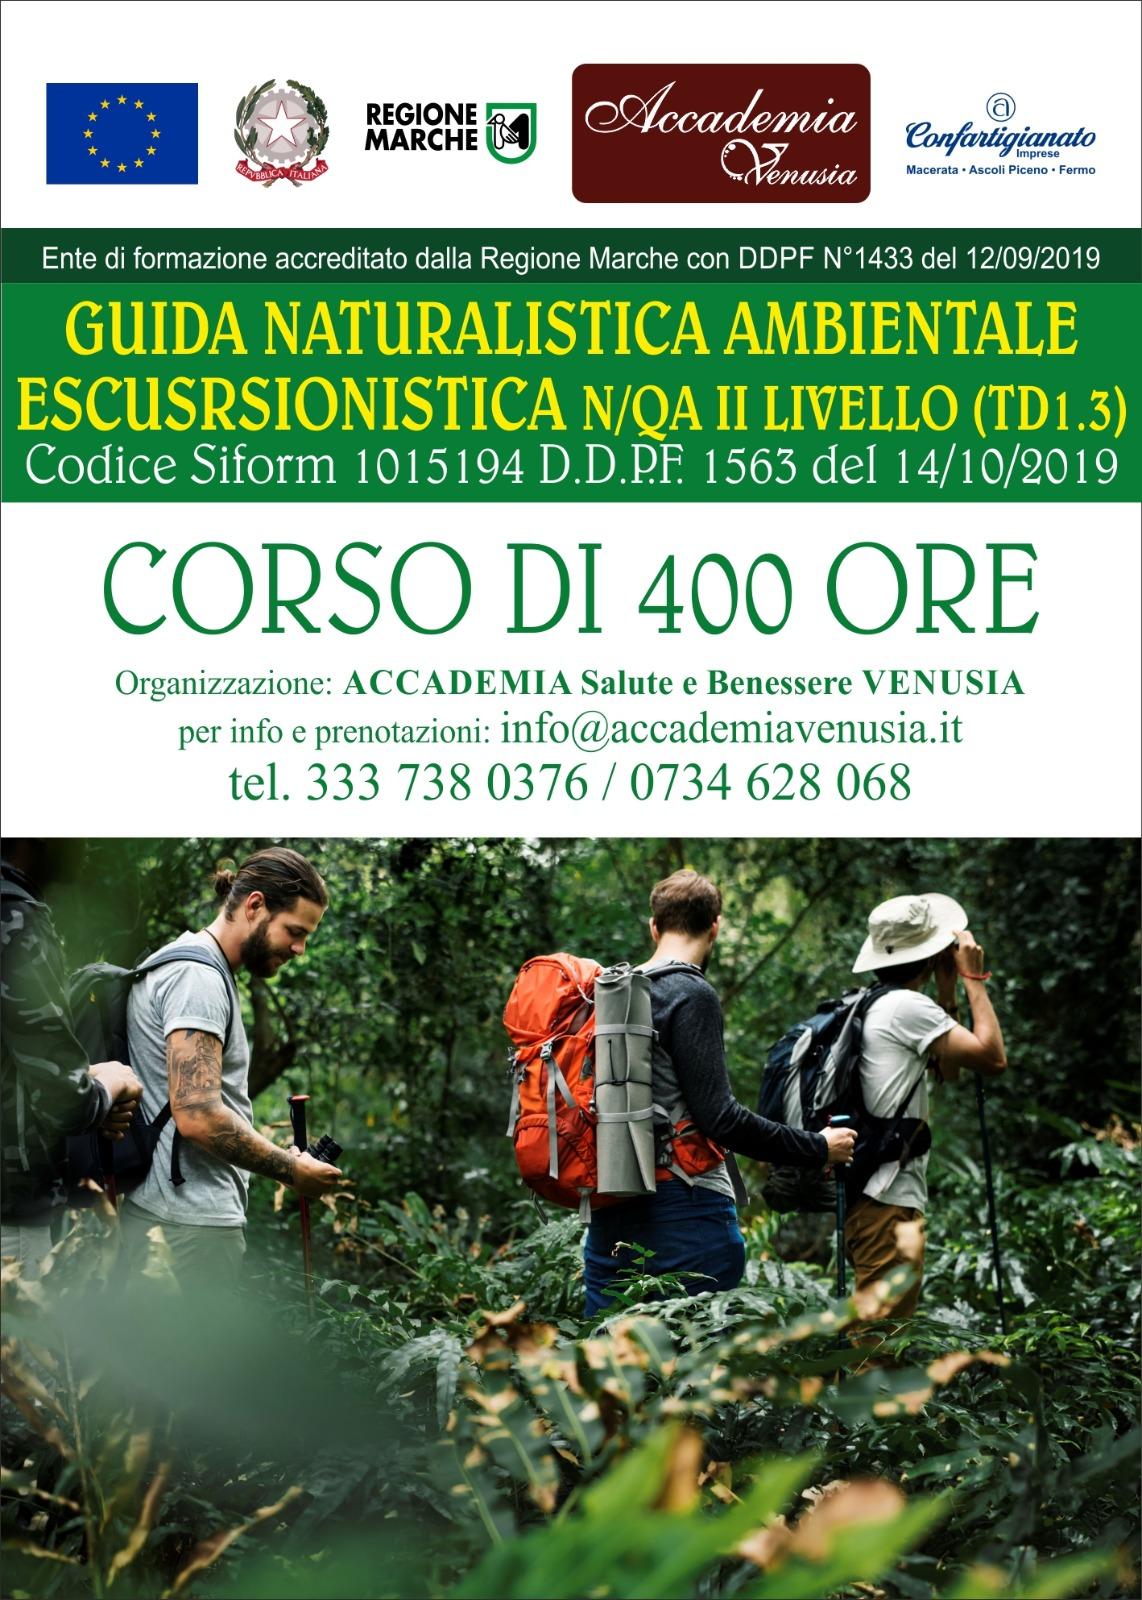 guida naturalistica escursionistica ambientale